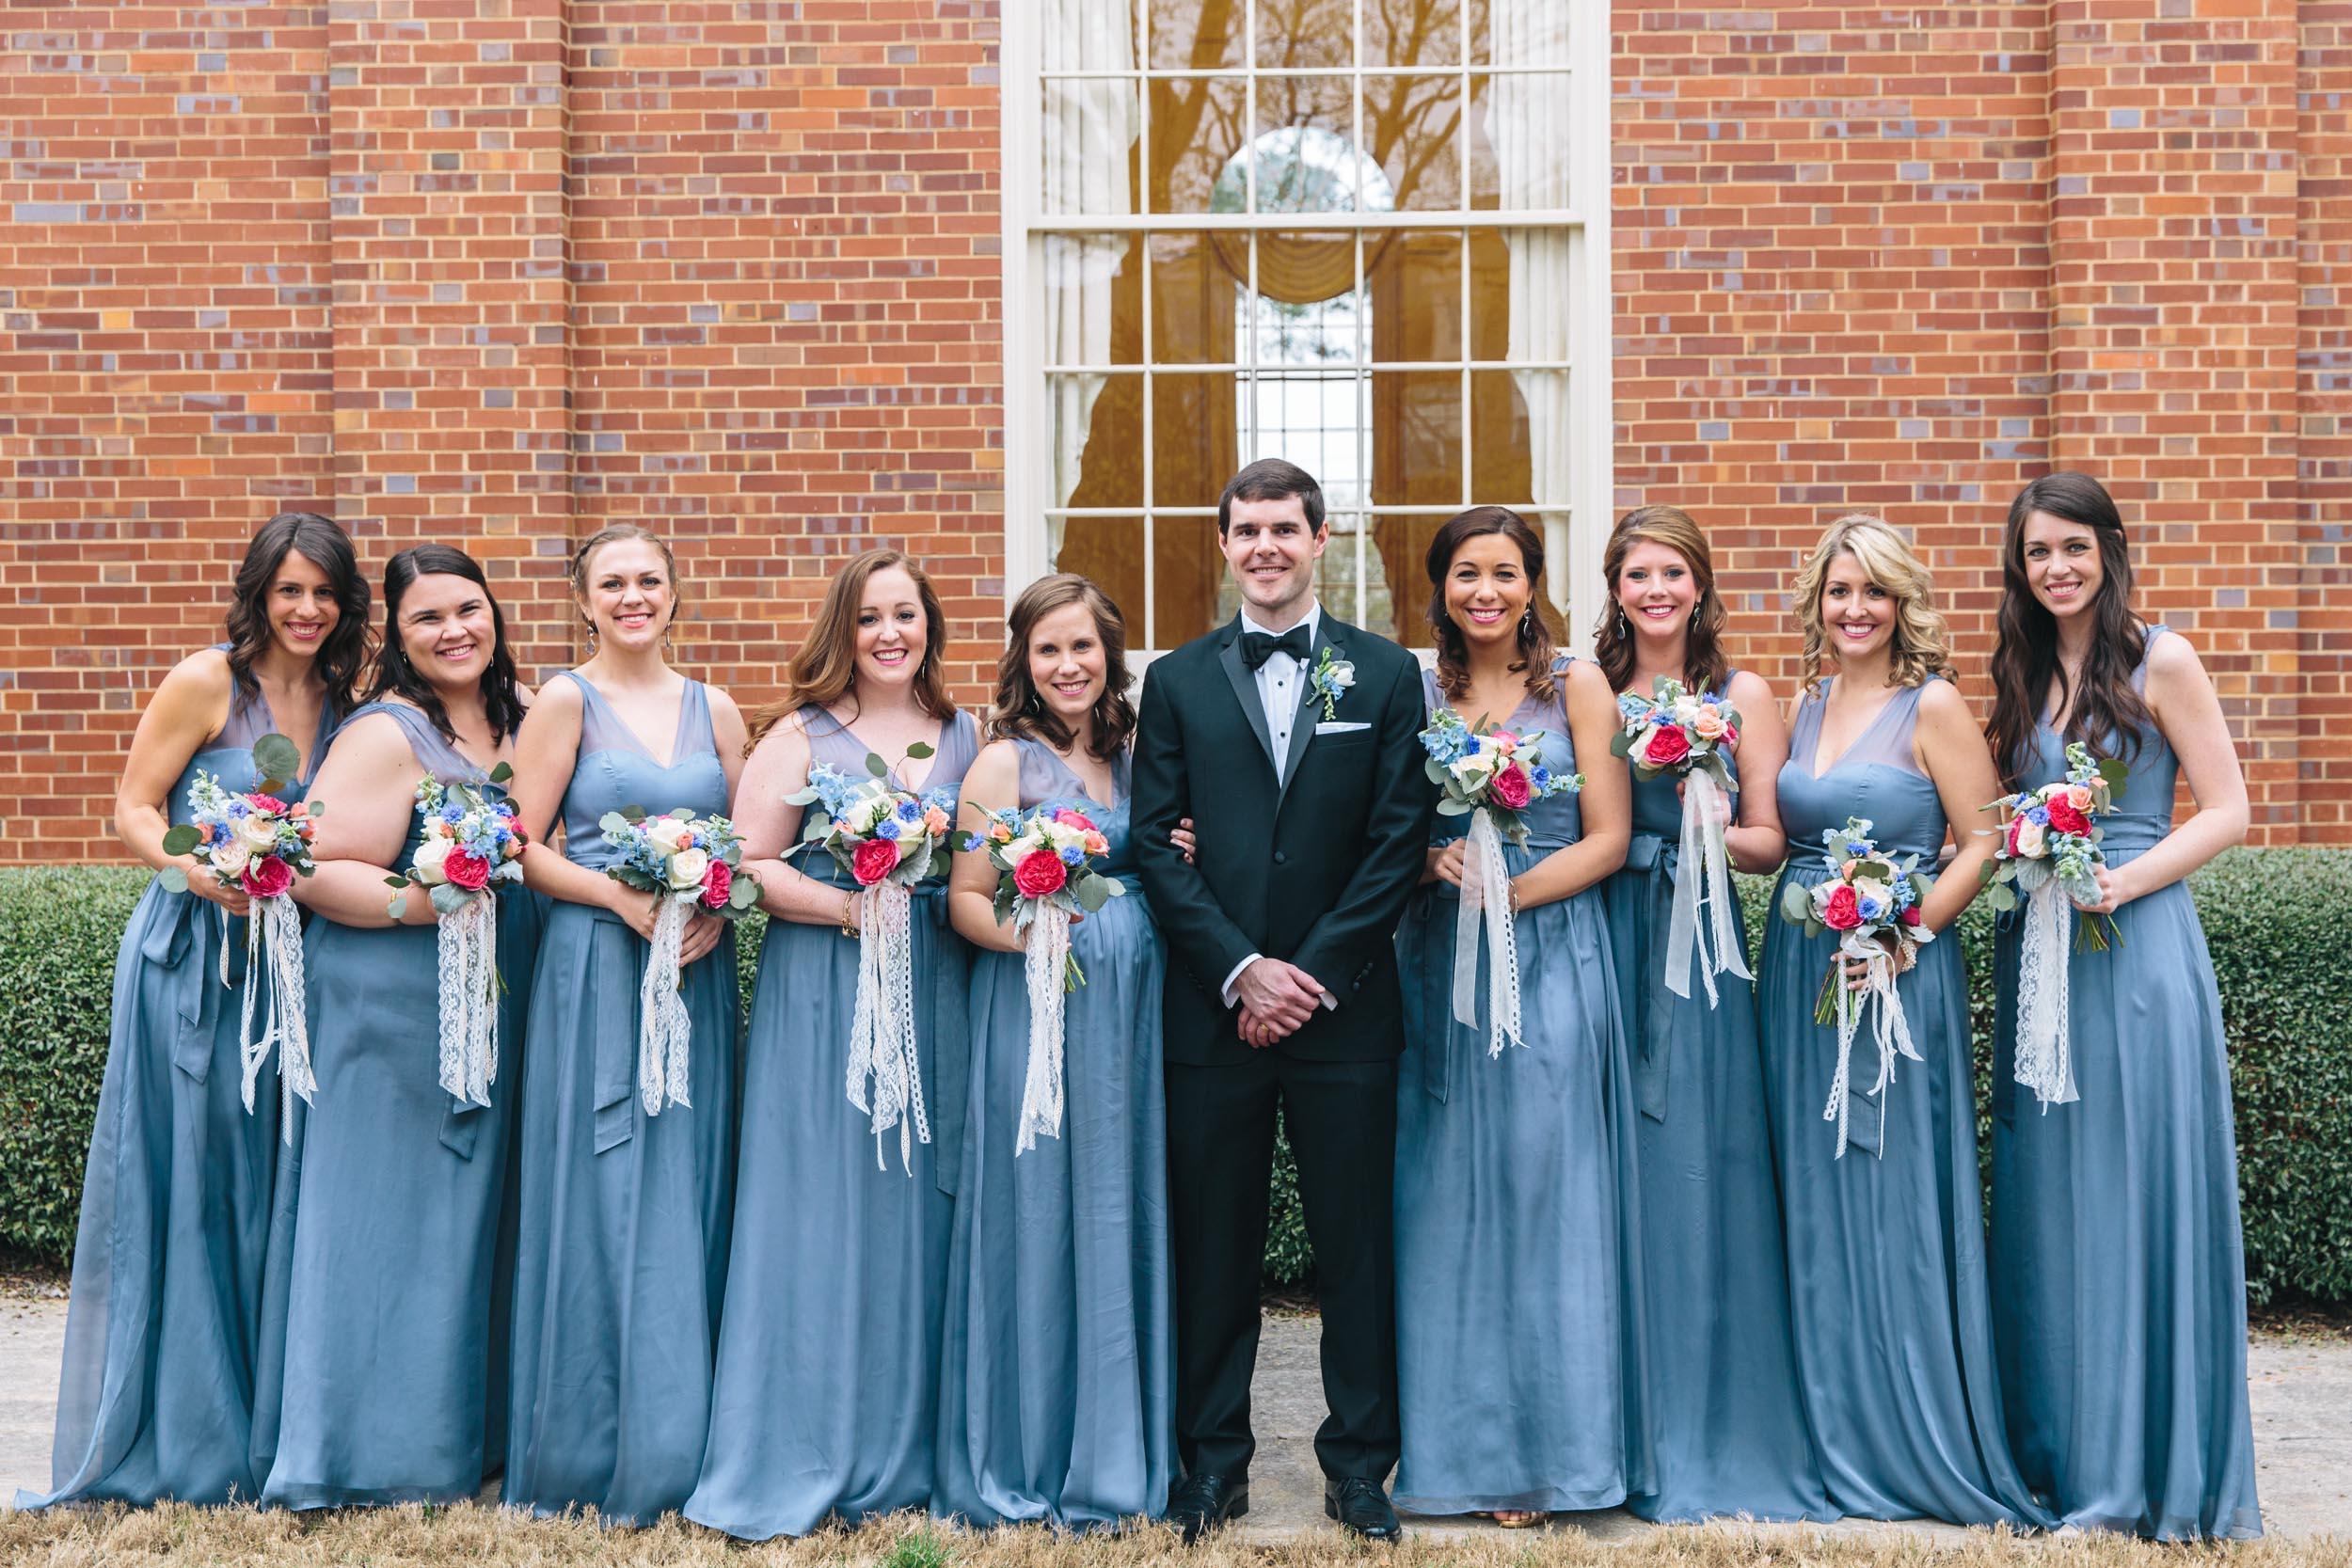 jimmy-rowalt-atlanta-wedding-photography-088.jpg